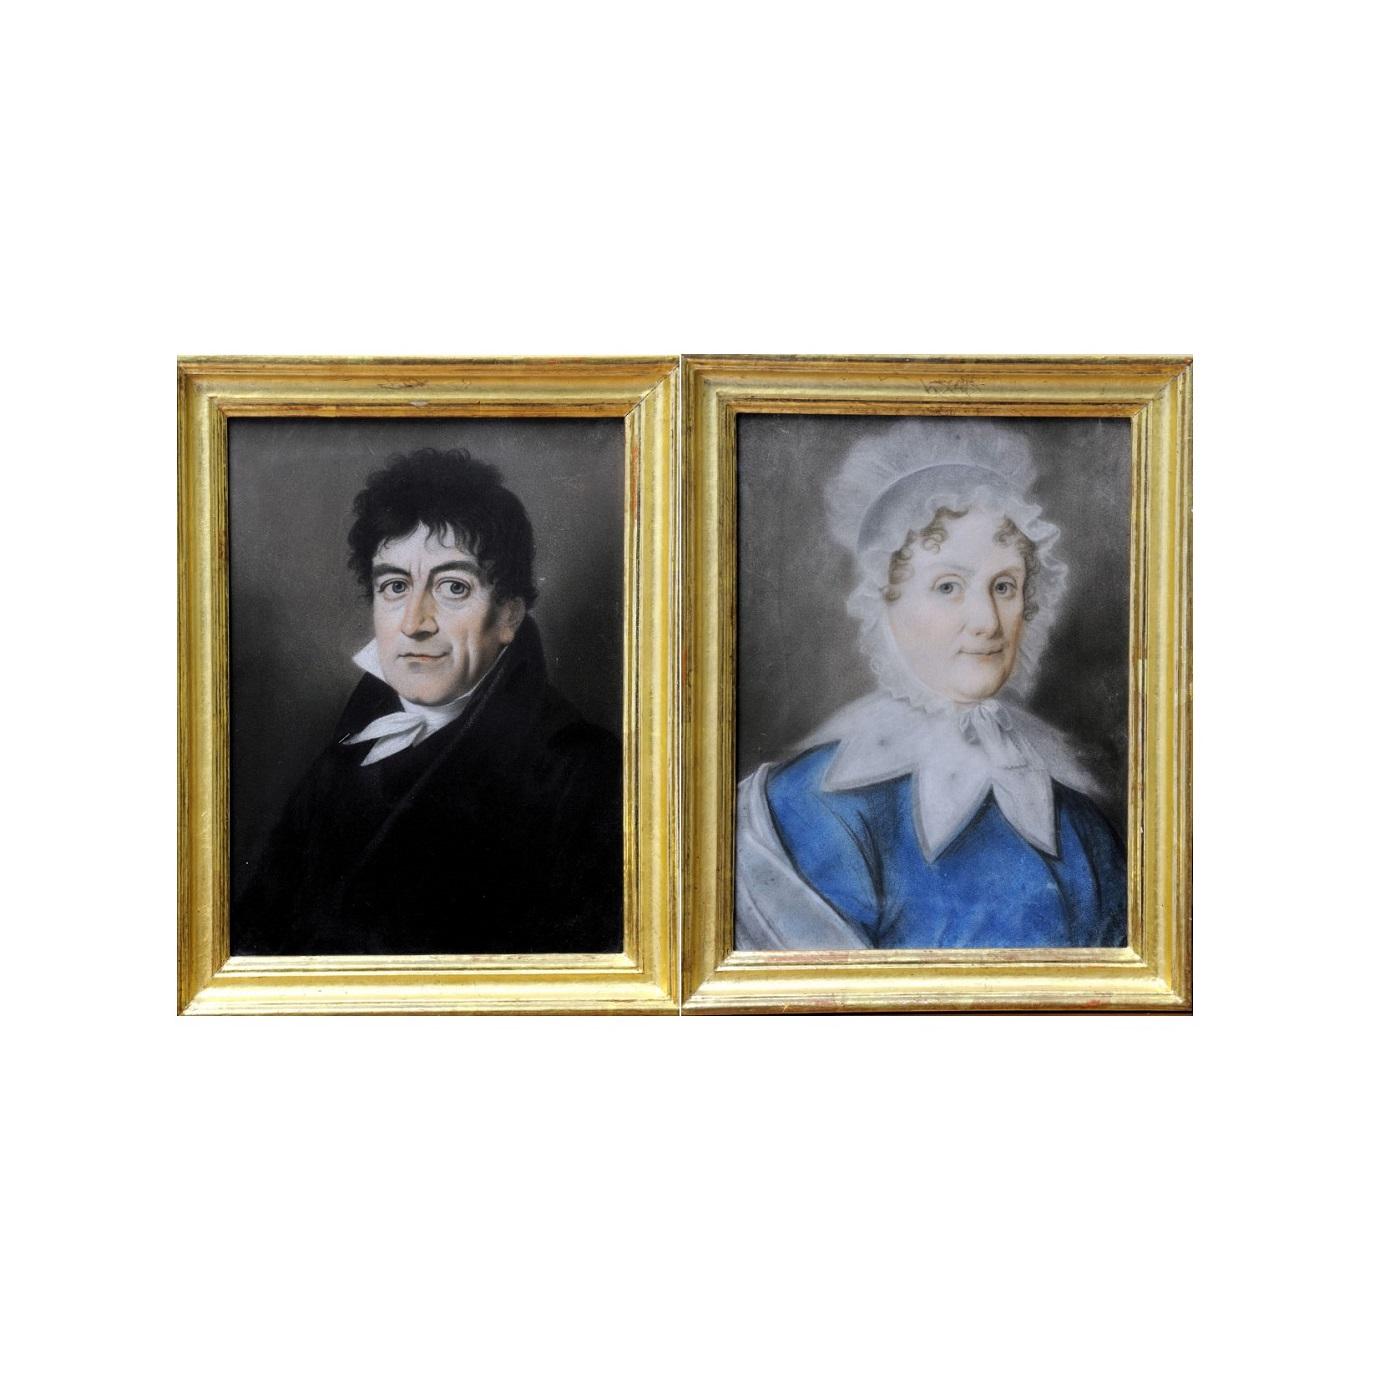 "ESCUELA INGLESA SIGLO XVIII. Pastel sobre cartoncillo. """"Pareja de retratos"""